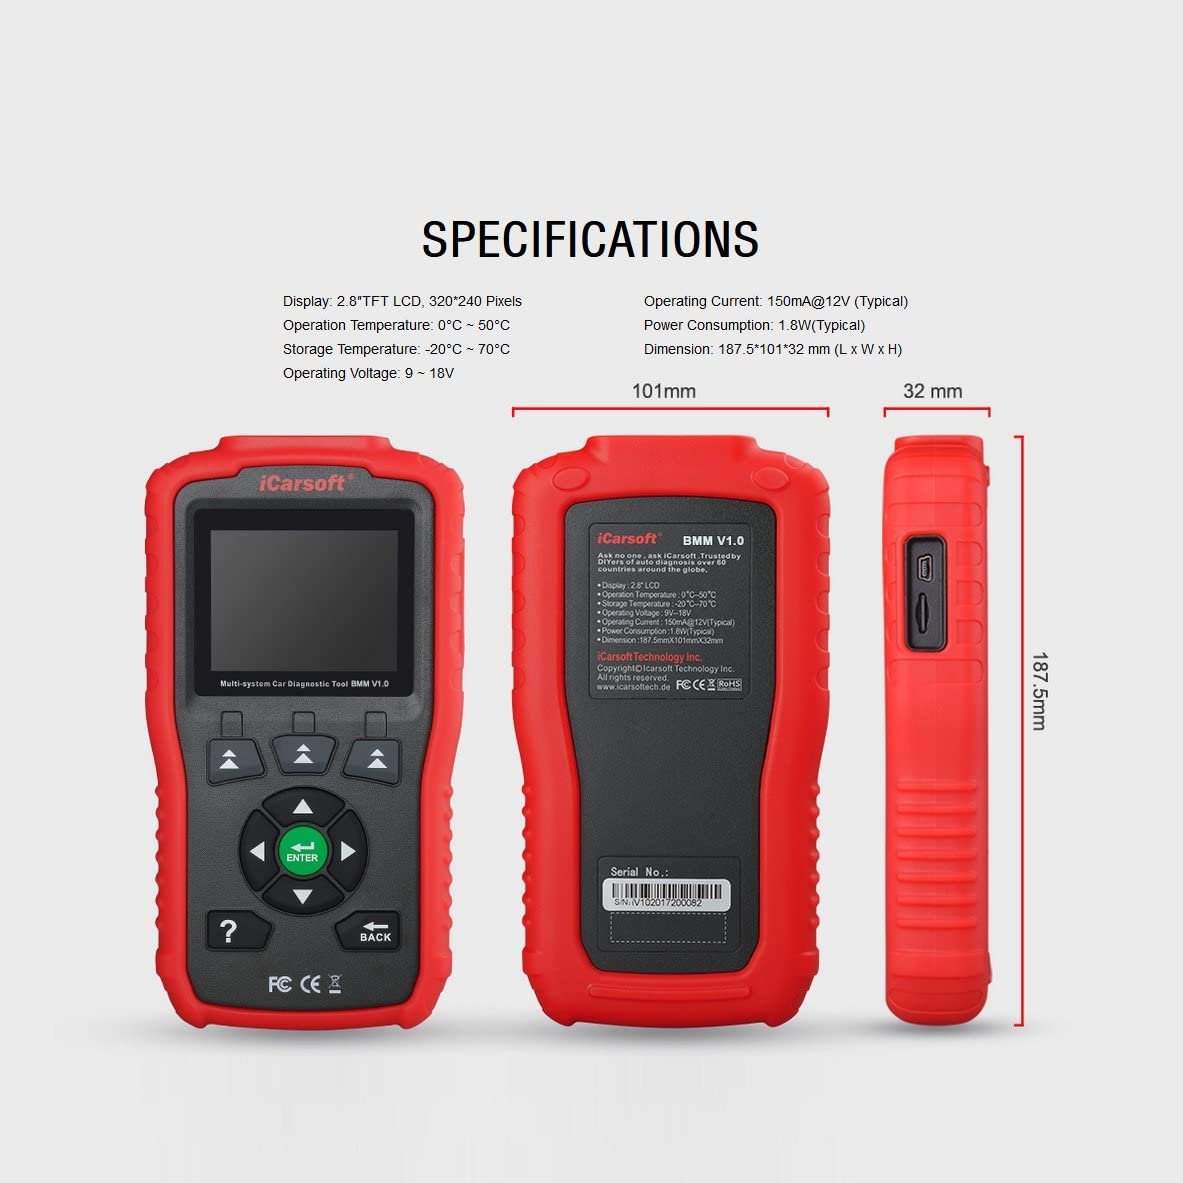 iCarsoft LR V1.0 Auto Diagnostic Scanner BMM V1.0 for BMW and Mini Oil Service Reset and Battery Test New Version of I910 Red